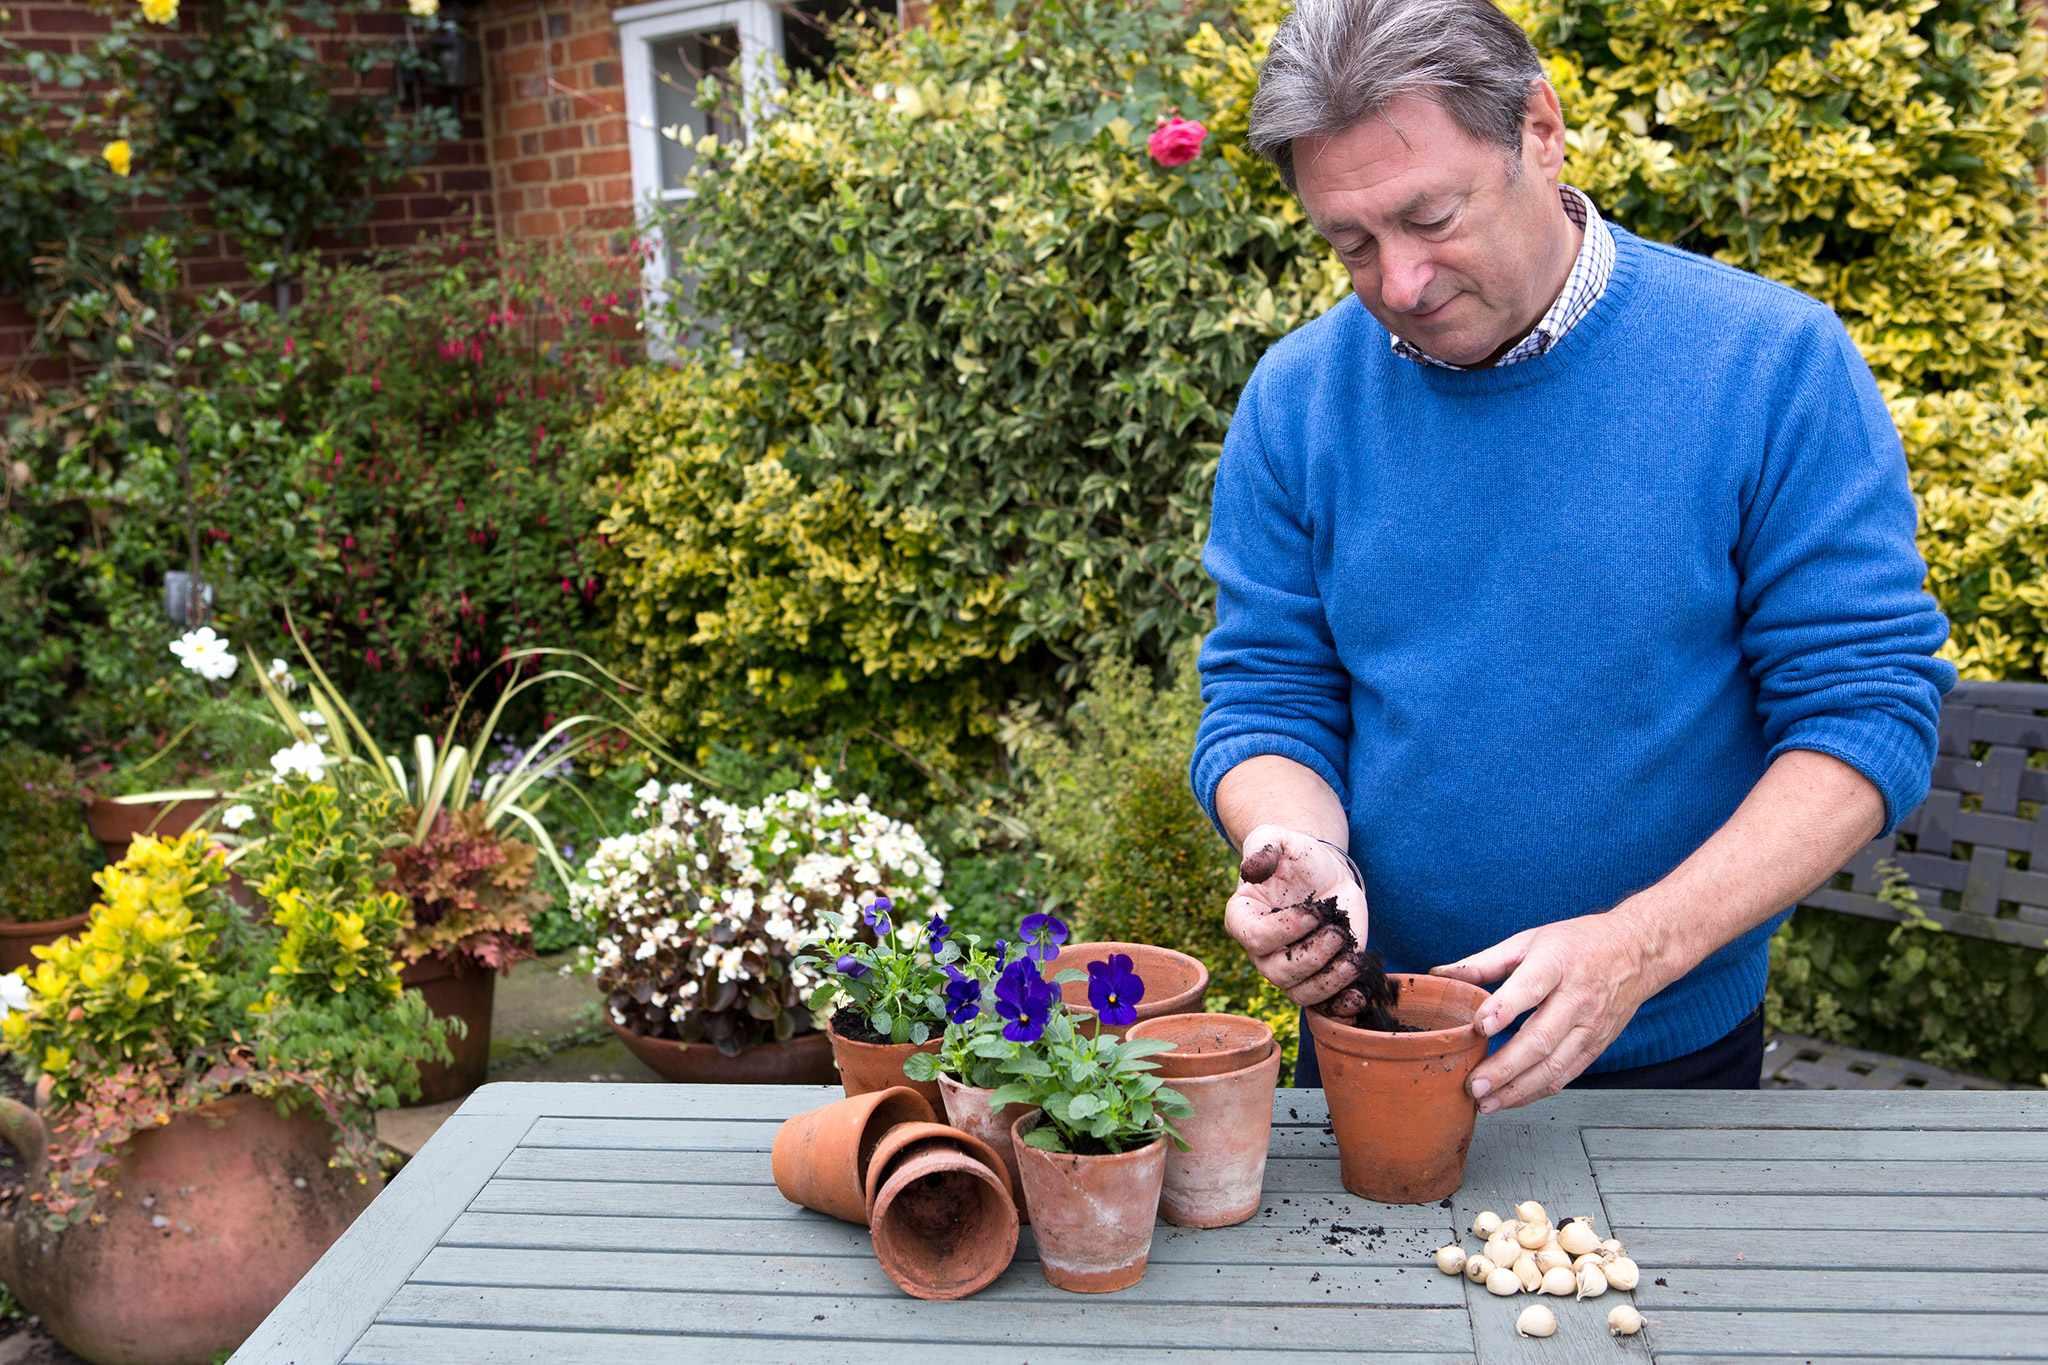 Alan Titchmarsh plants winter flowering iris bulbs